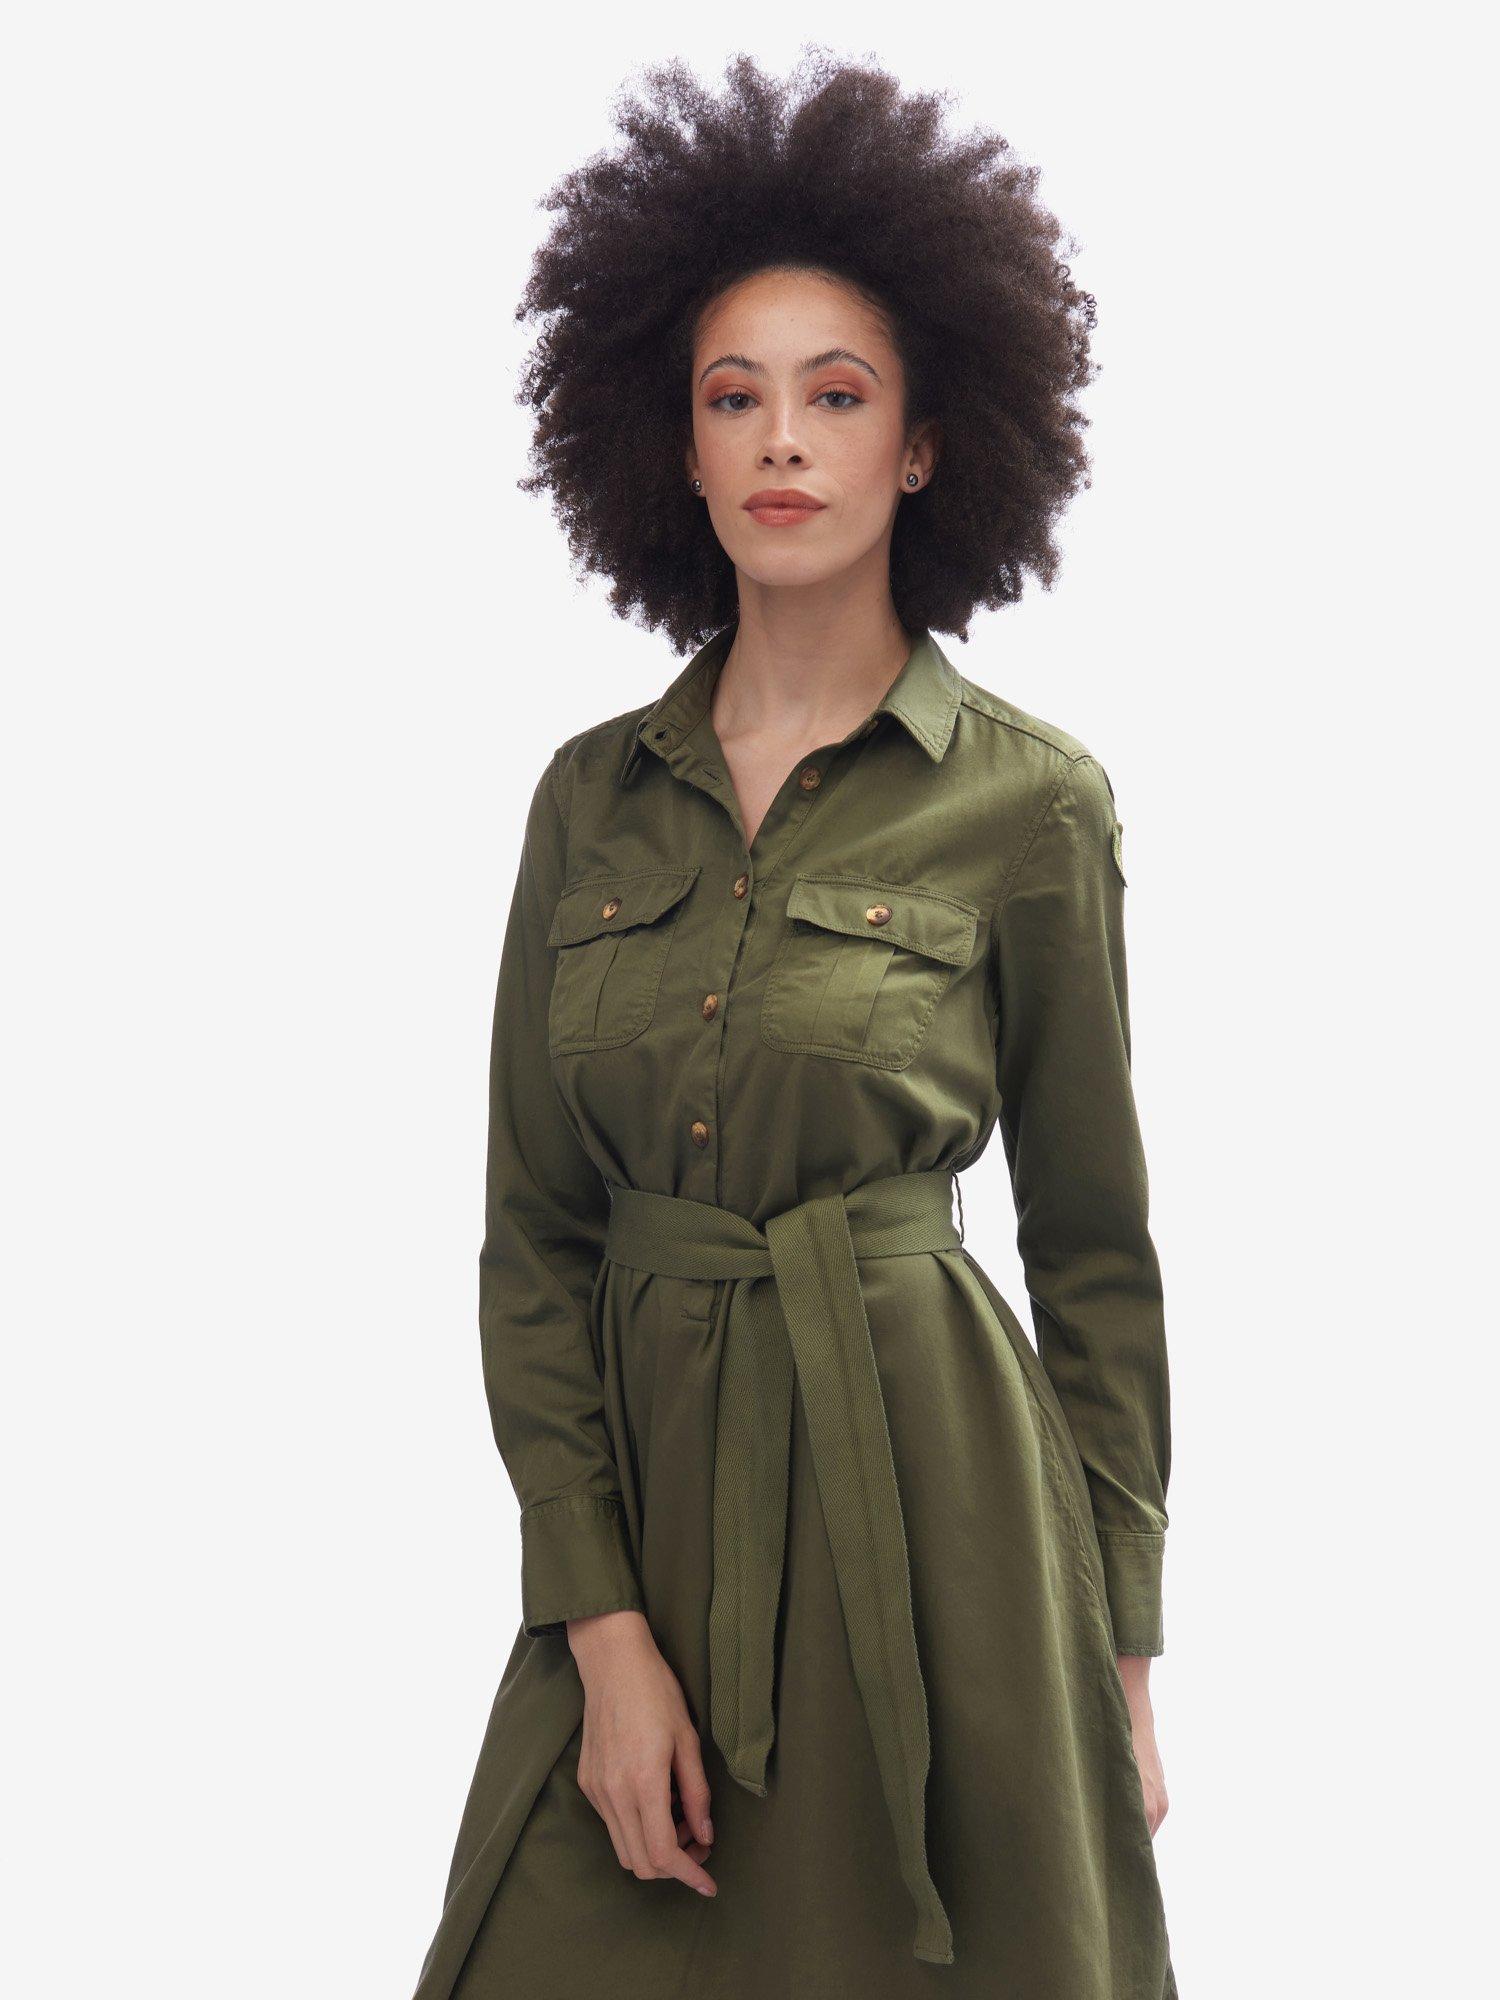 Blauer - LONG-SLEEVED COTTON DRESS - Pine Cone Green - Blauer